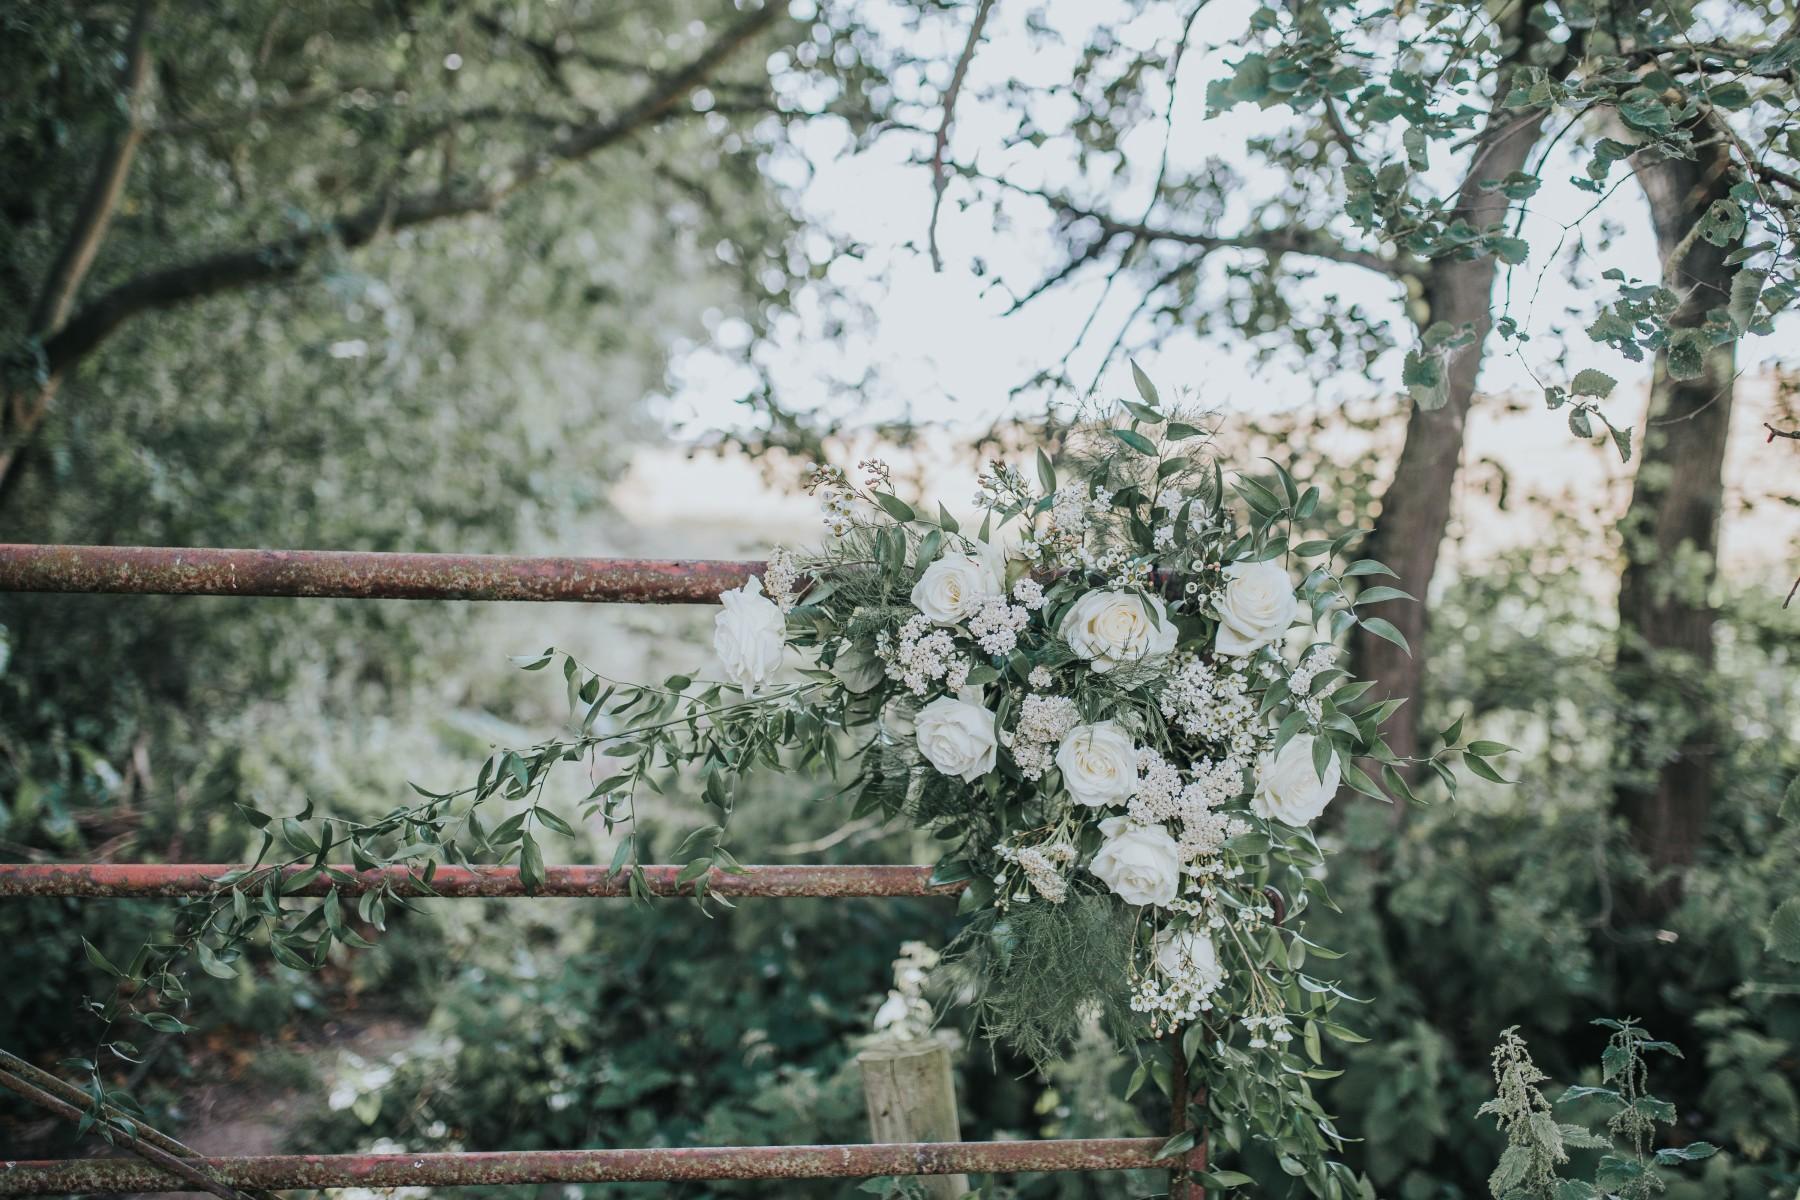 fairy wedding - whimsical wedding - magical wedding - white wedding flowers